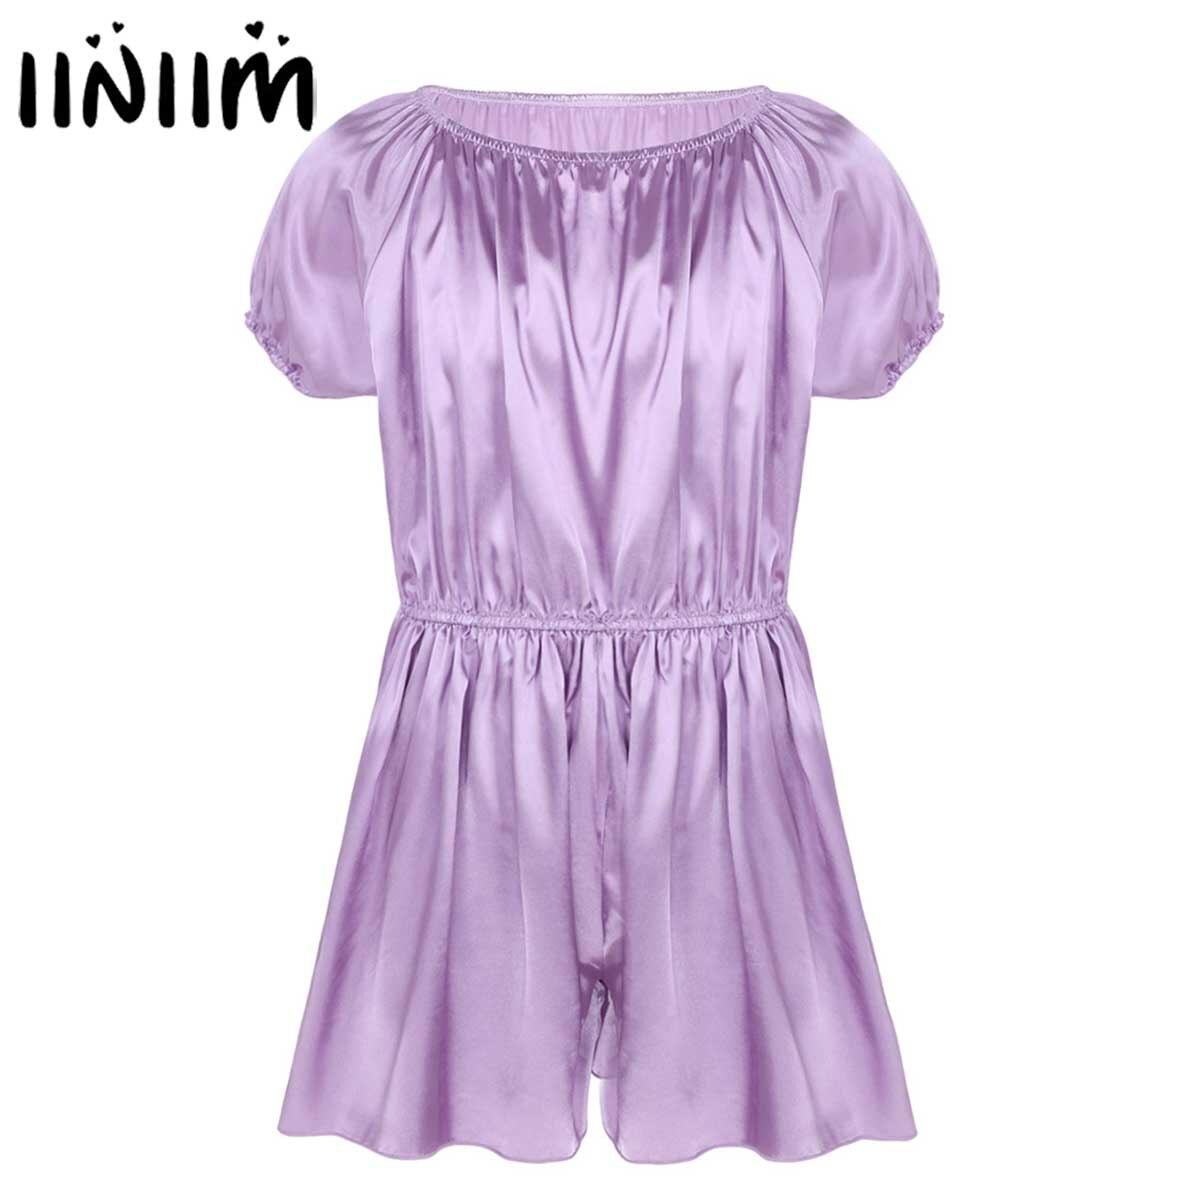 Mens Sissy Lingerie Bodysuit Short Sleeve Elastic Neckline And Waist Soft Shiny Frilly Satin Dress Pants Nightwear Girly Pajamas